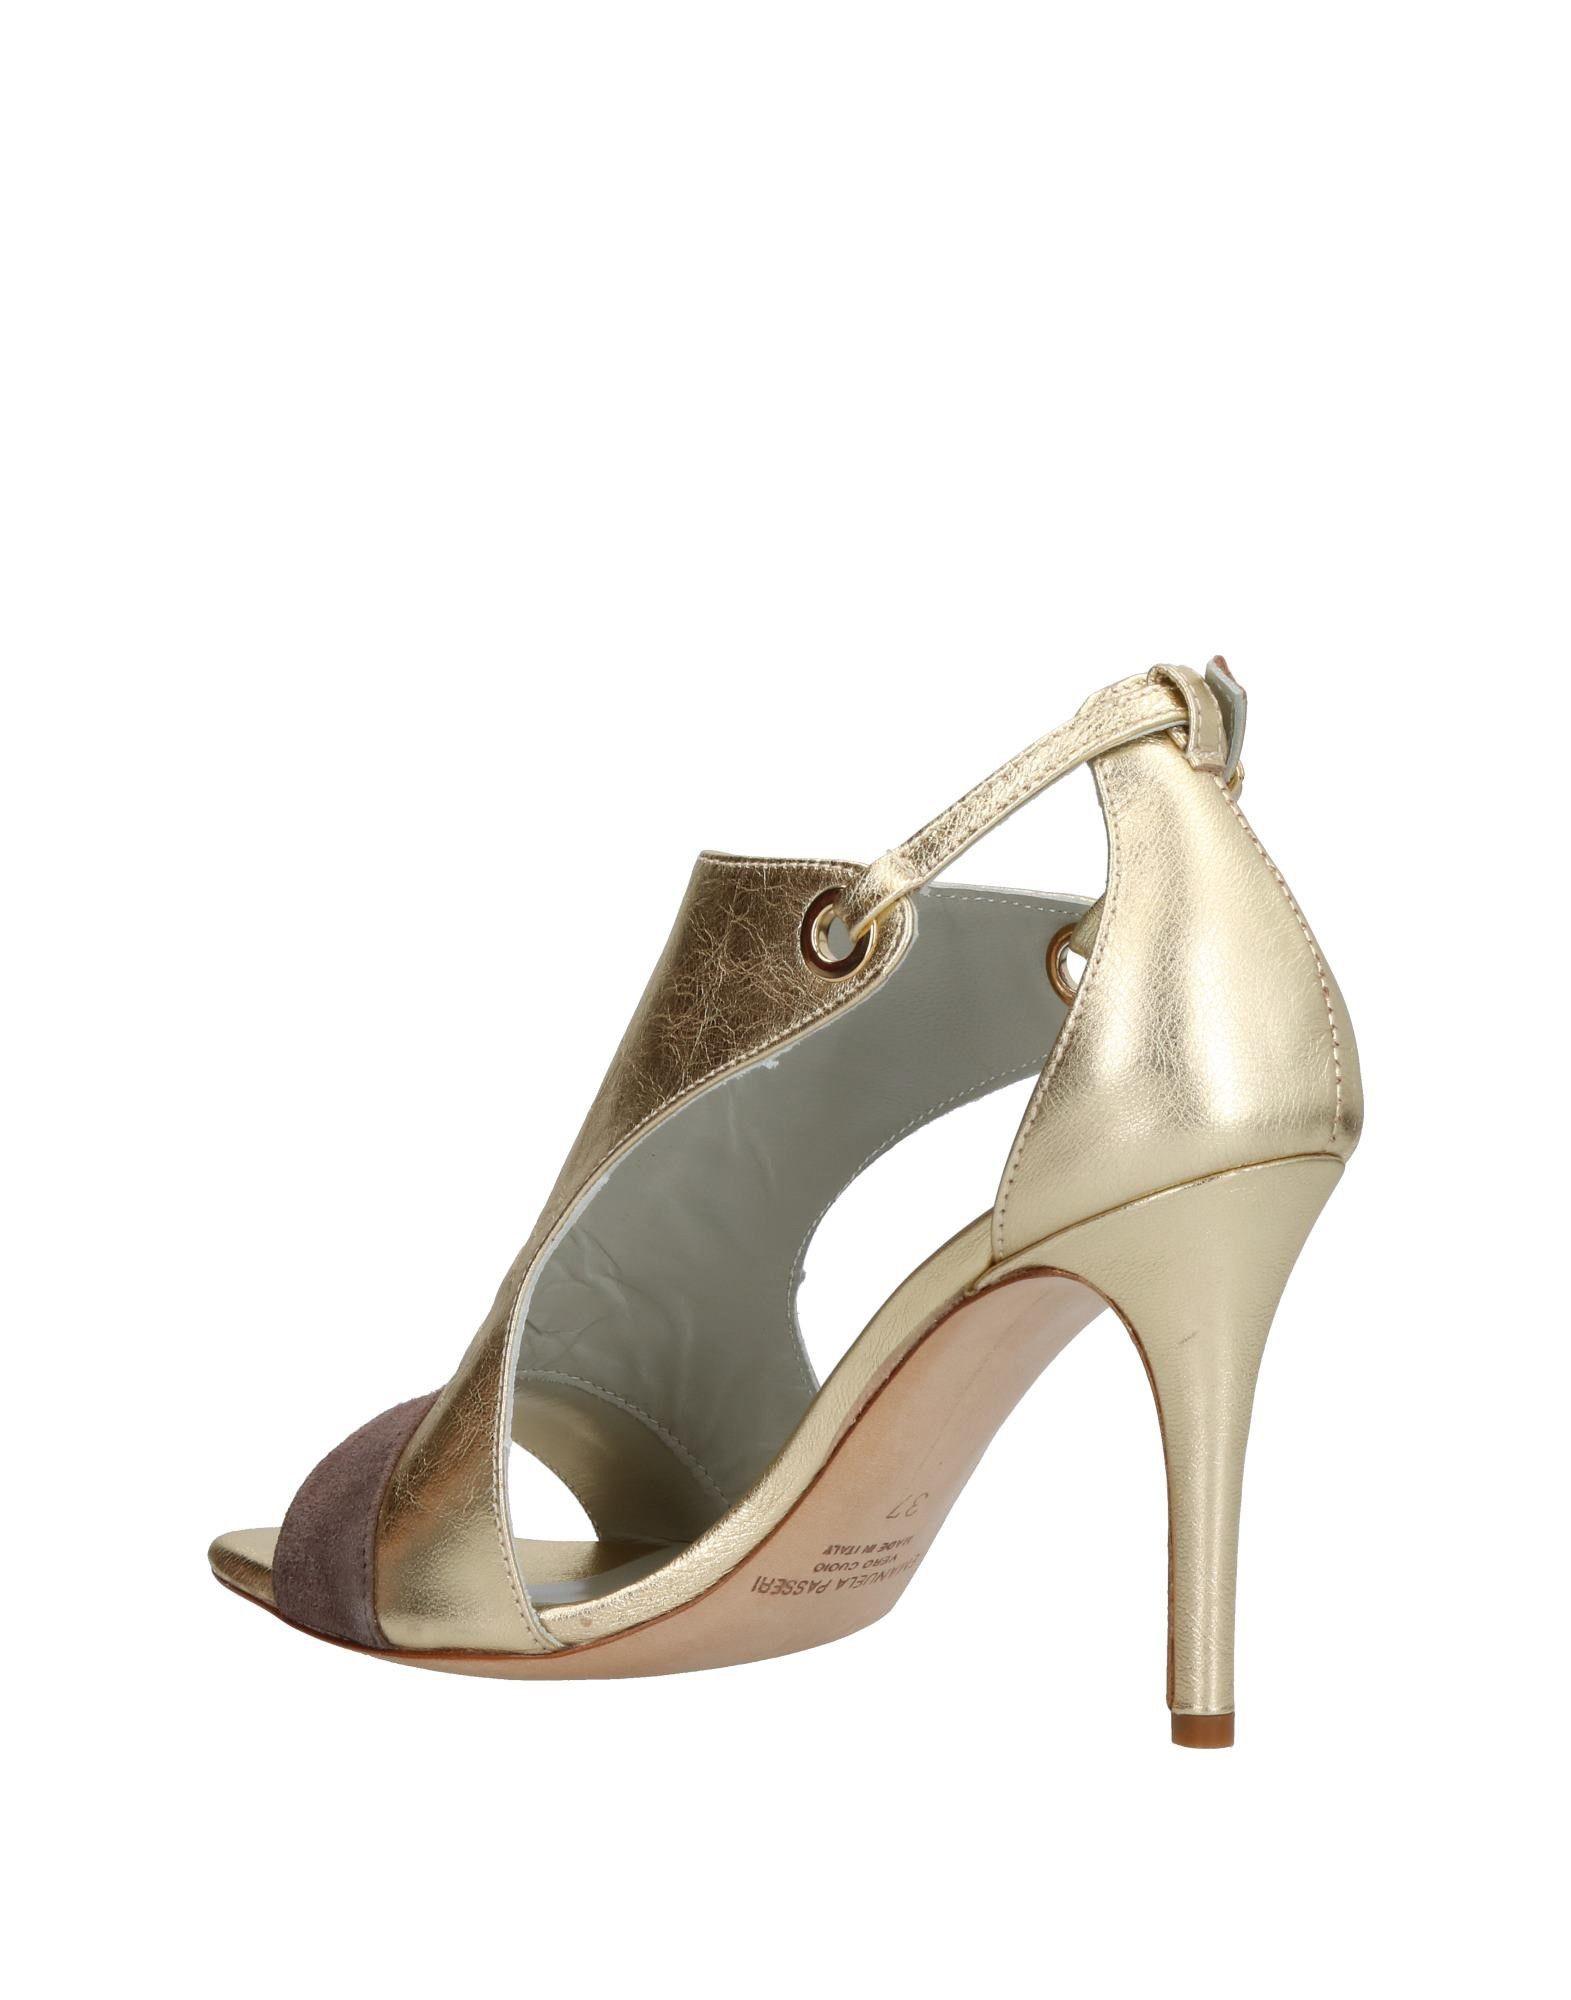 Emanuela 11331637QO Passeri Sandalen Damen  11331637QO Emanuela Gute Qualität beliebte Schuhe 5d49df